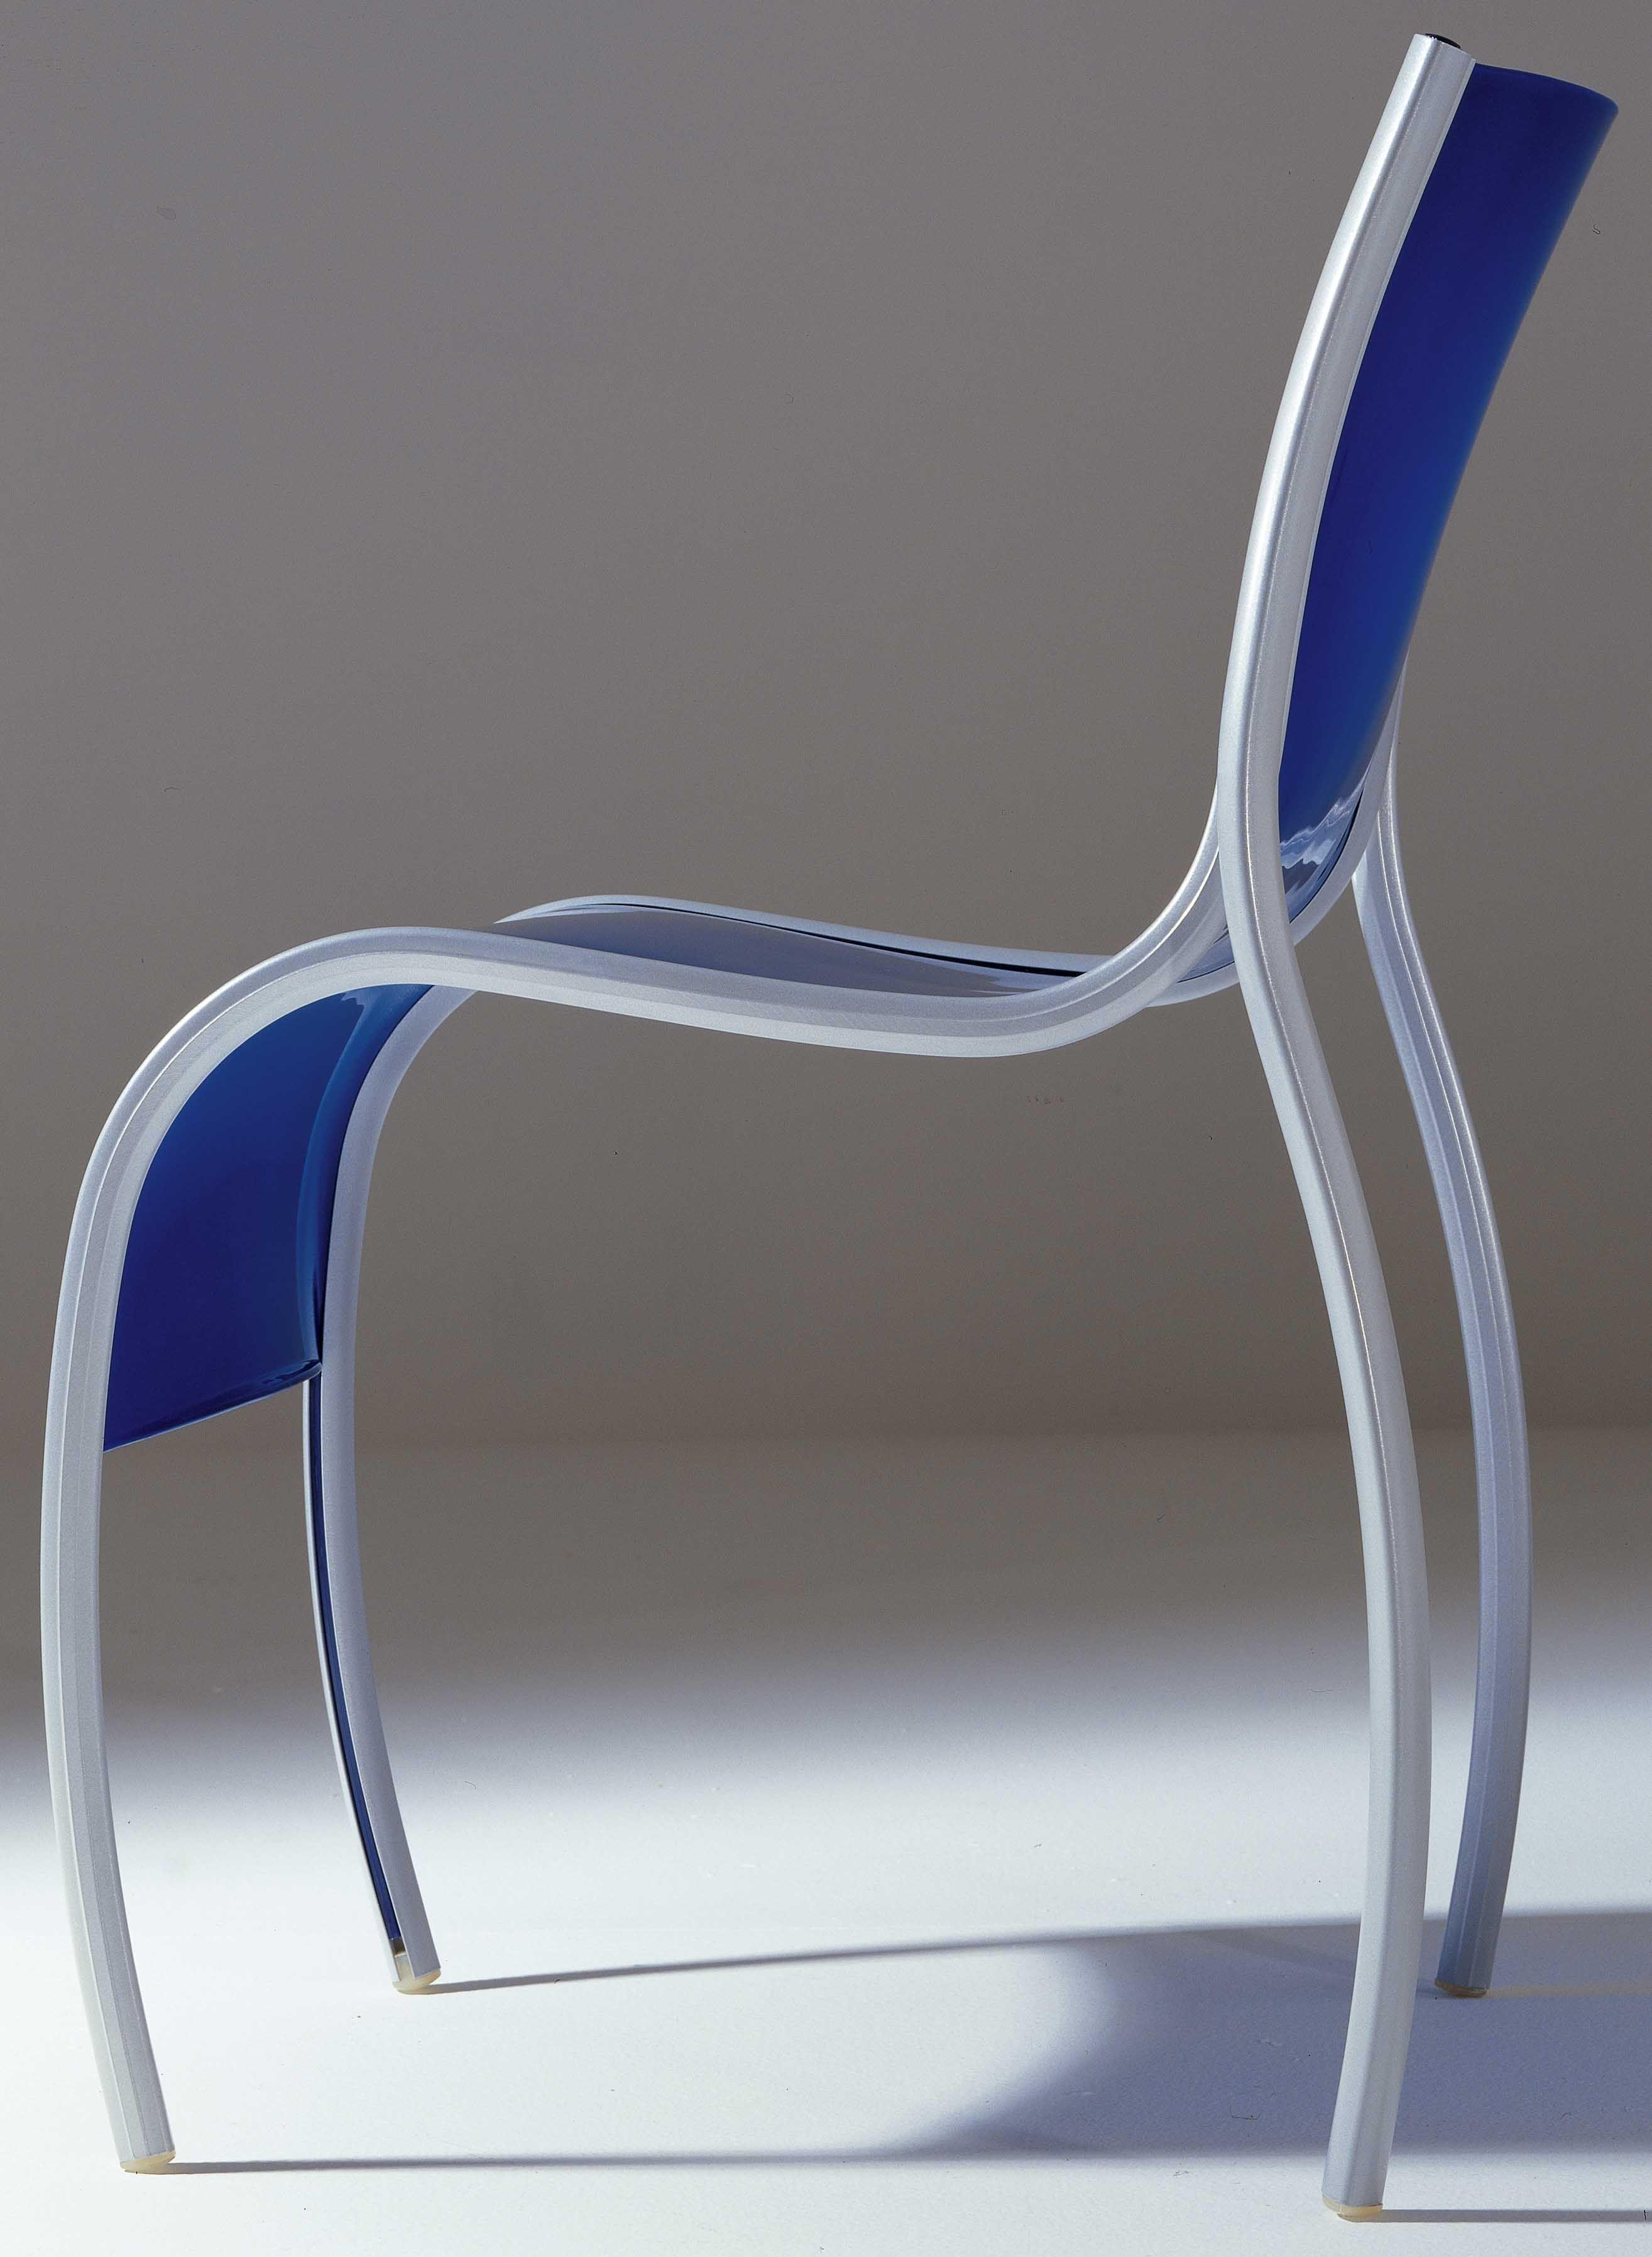 chaise empilable fpe plastique m tal bleu kartell. Black Bedroom Furniture Sets. Home Design Ideas